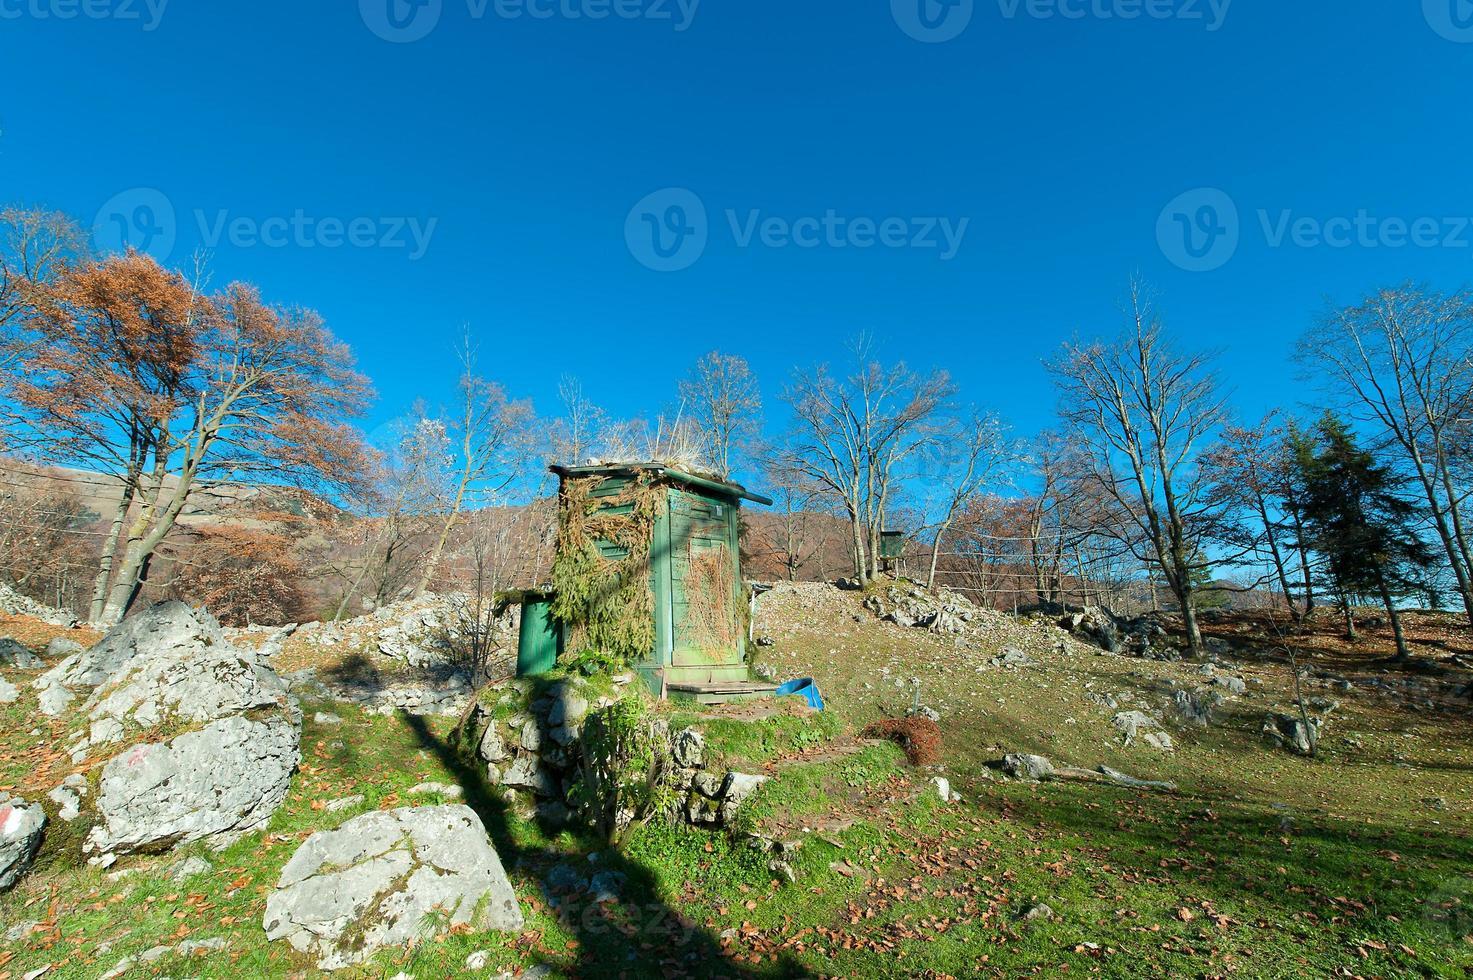 Hunting cabin on prealps italia photo